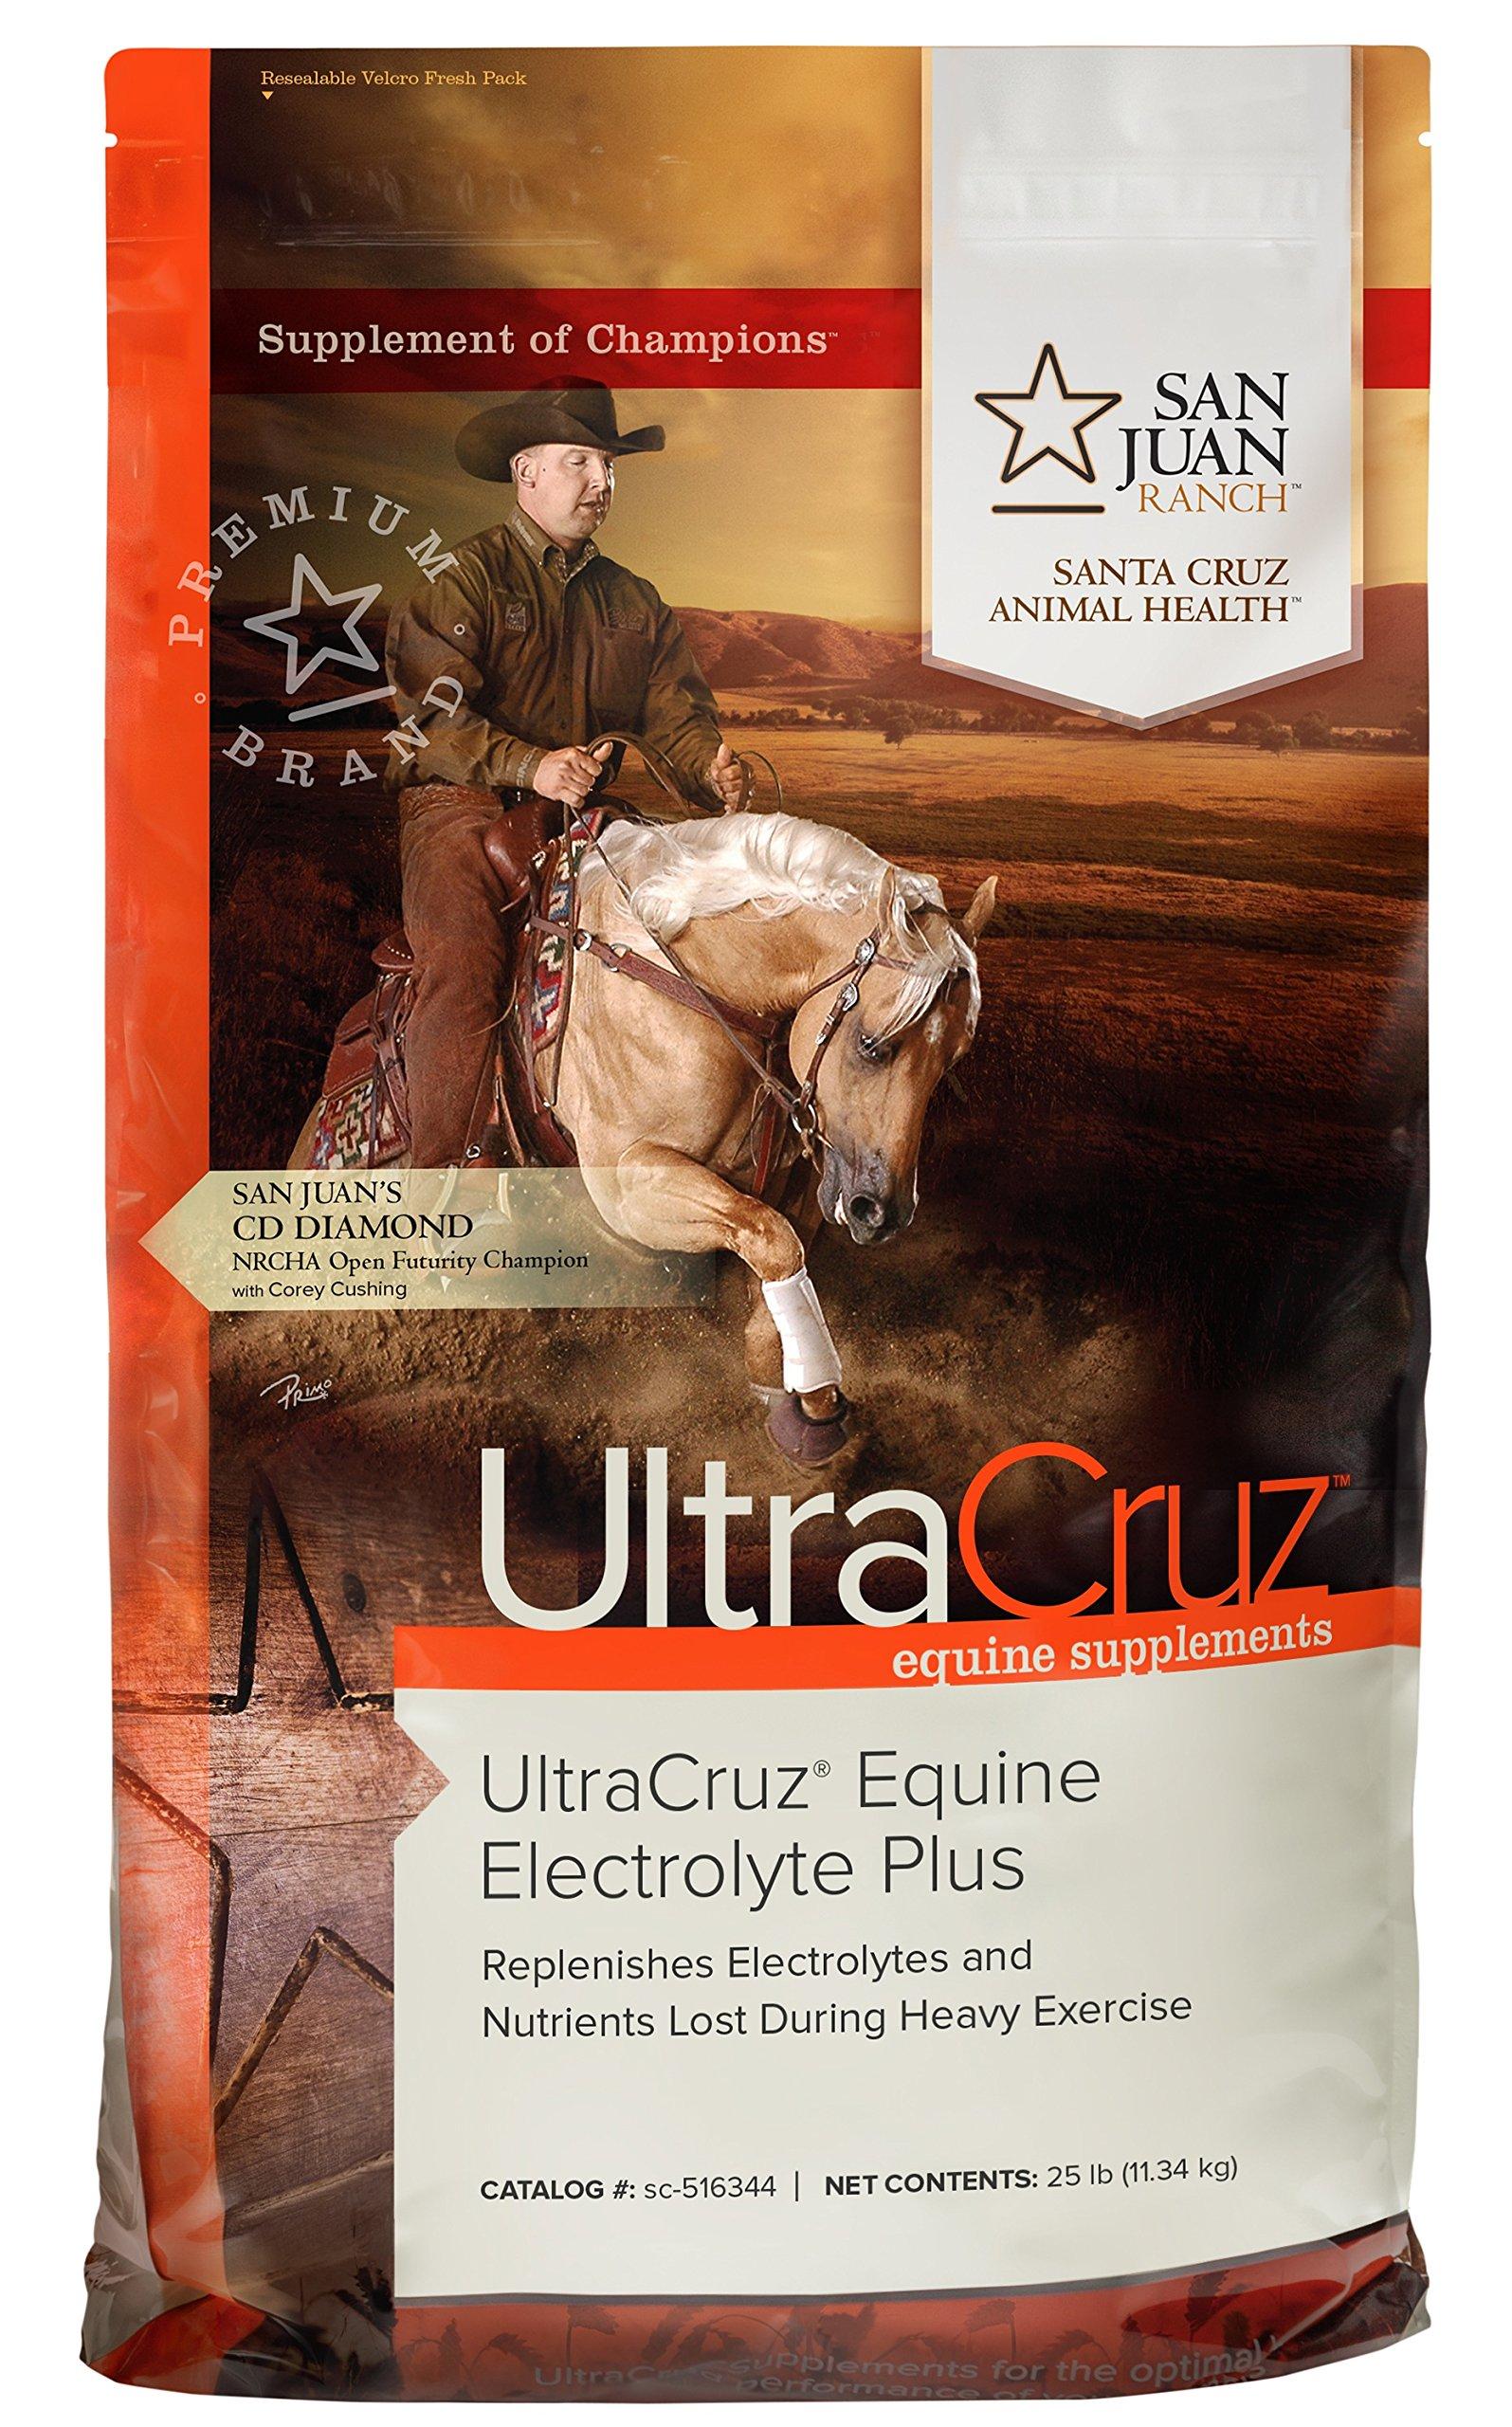 UltraCruz Equine Electrolyte Plus Supplement for Horses, 25 lb, Pellet (93 Day Supply) by UltraCruz